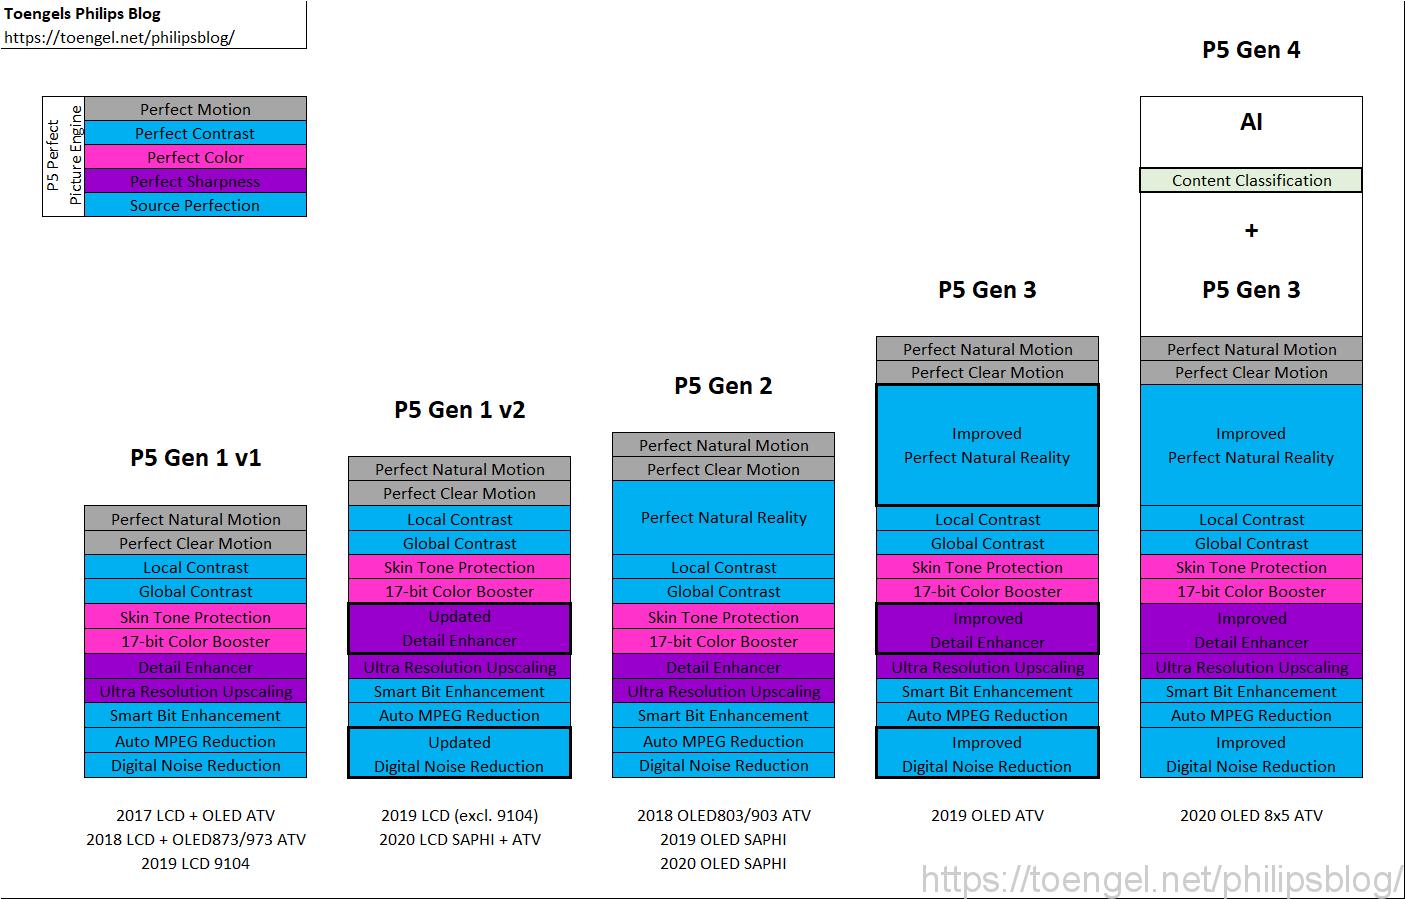 Philips: P5 Gen 1 vs. P5 Gen 2 vs. P5 Gen 3 vs. P5 Gen 4 AI